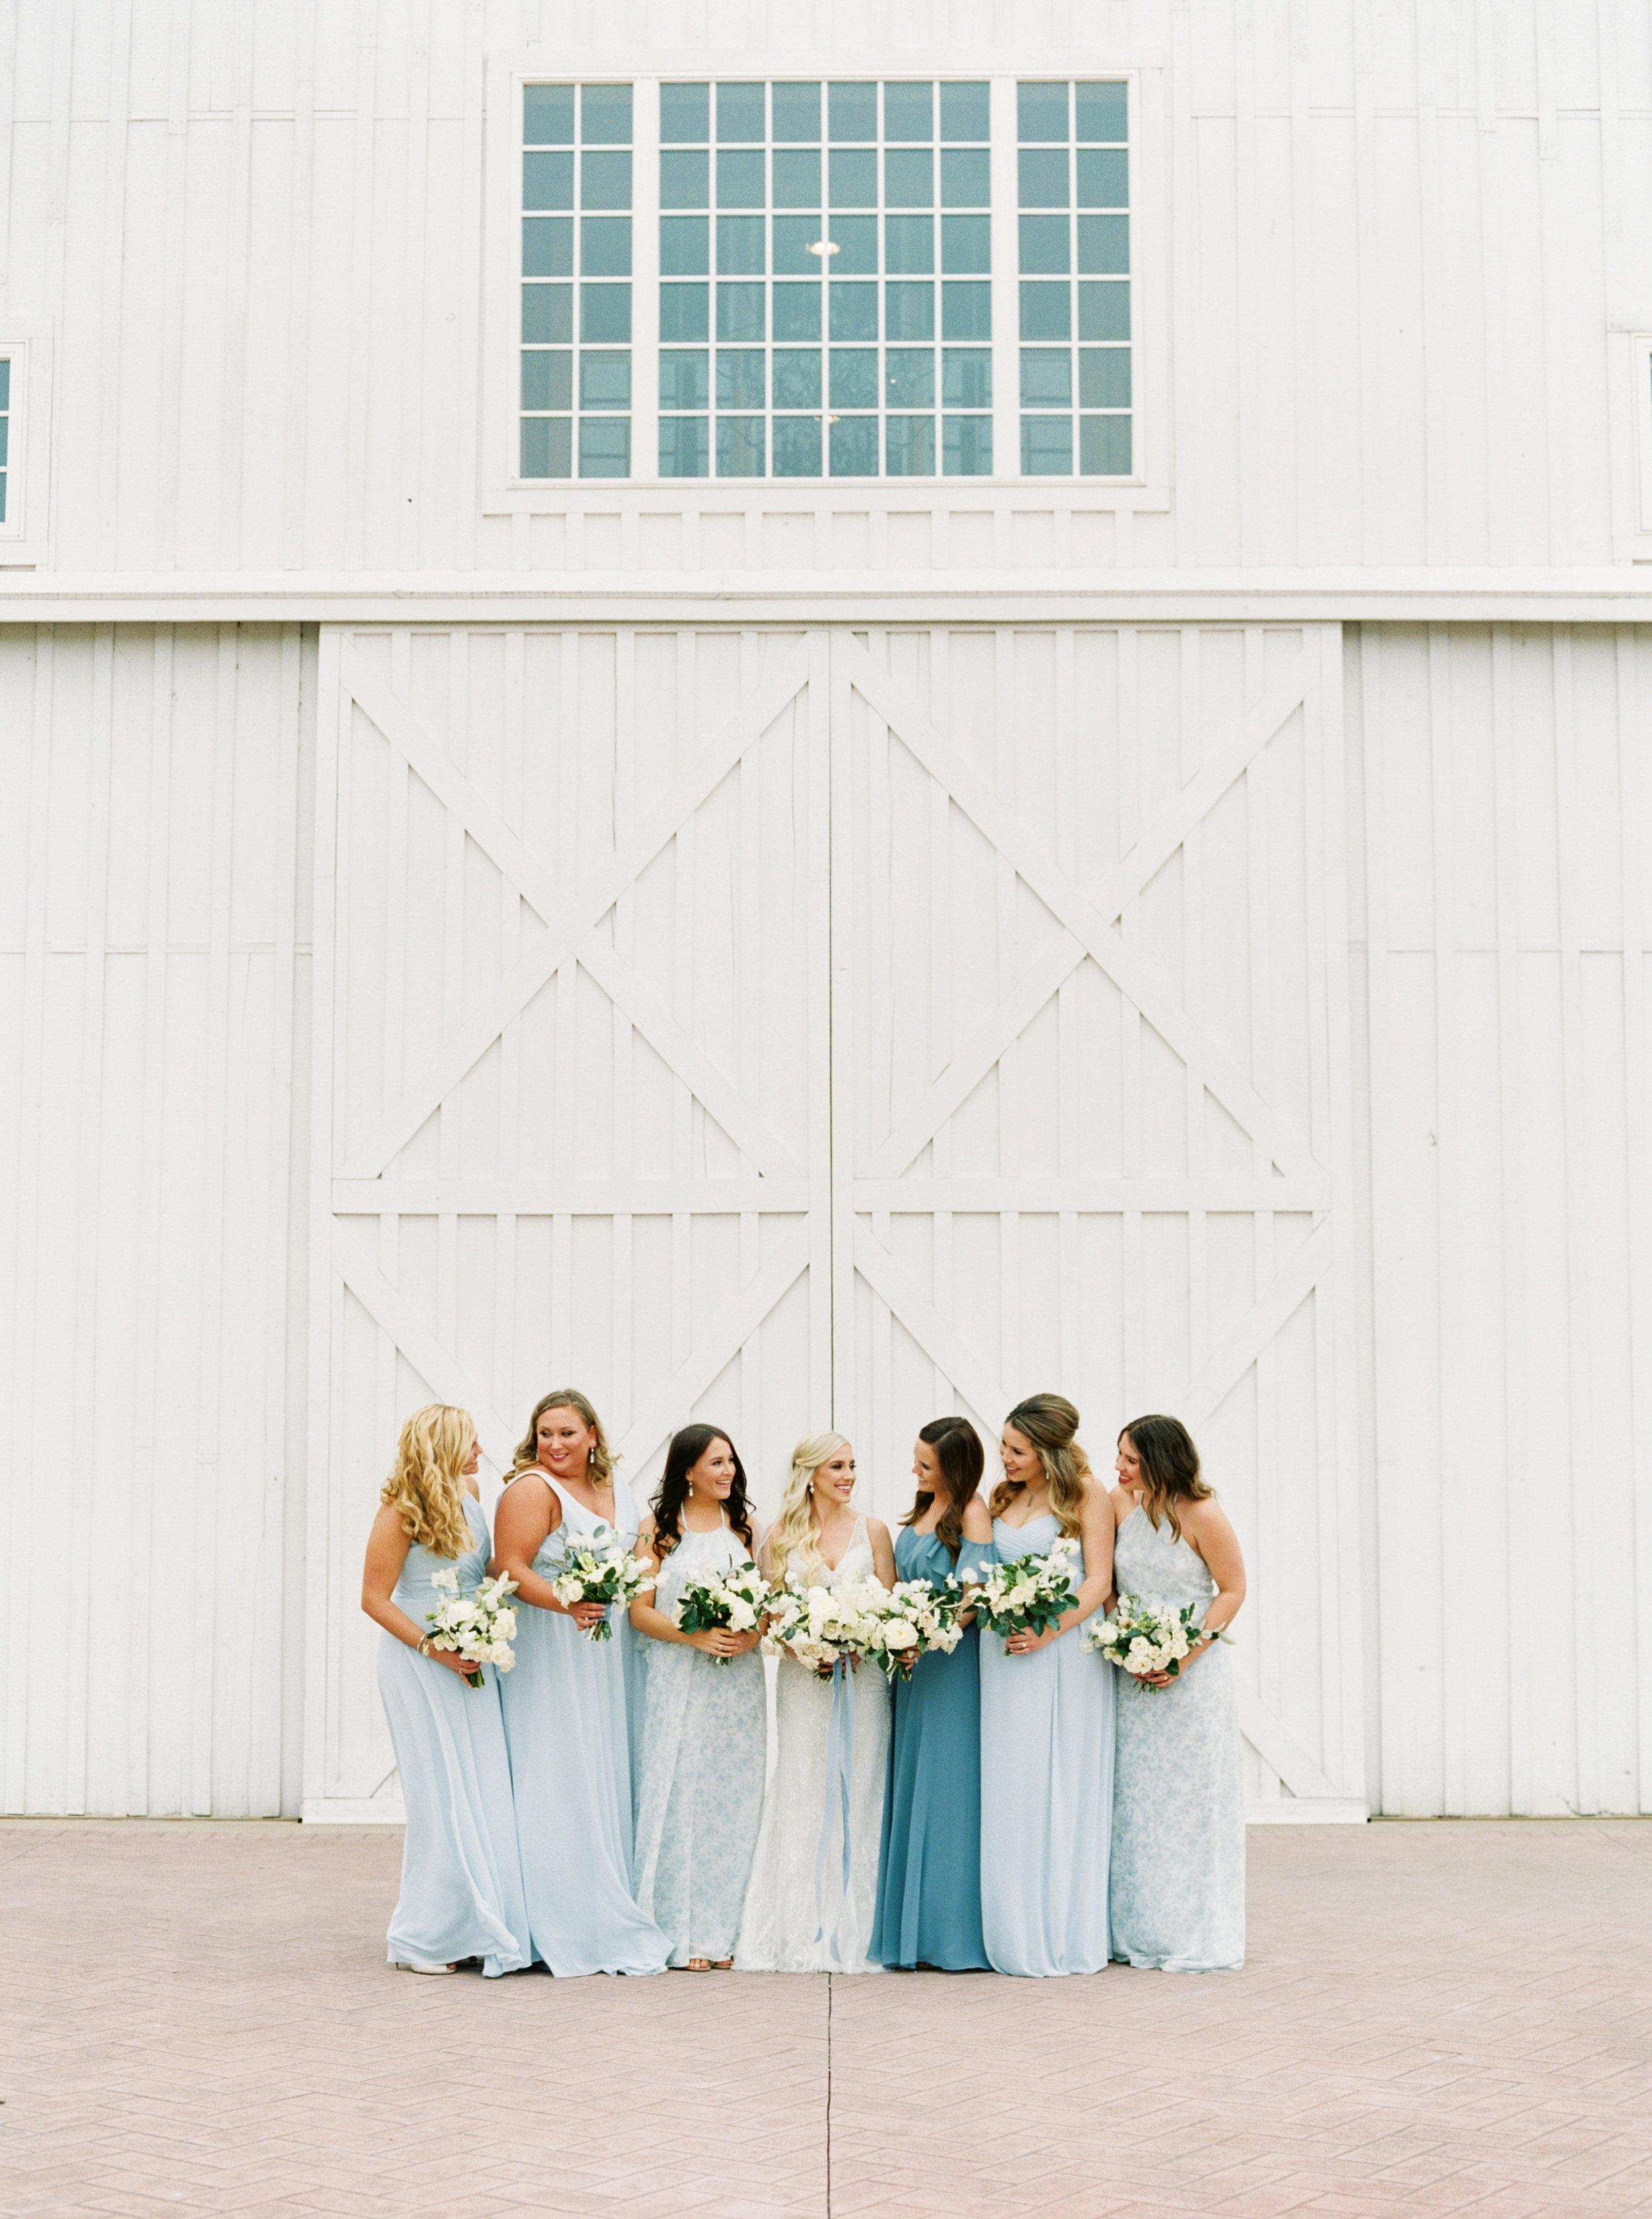 Chloe+Austin Wedding_443.JPG